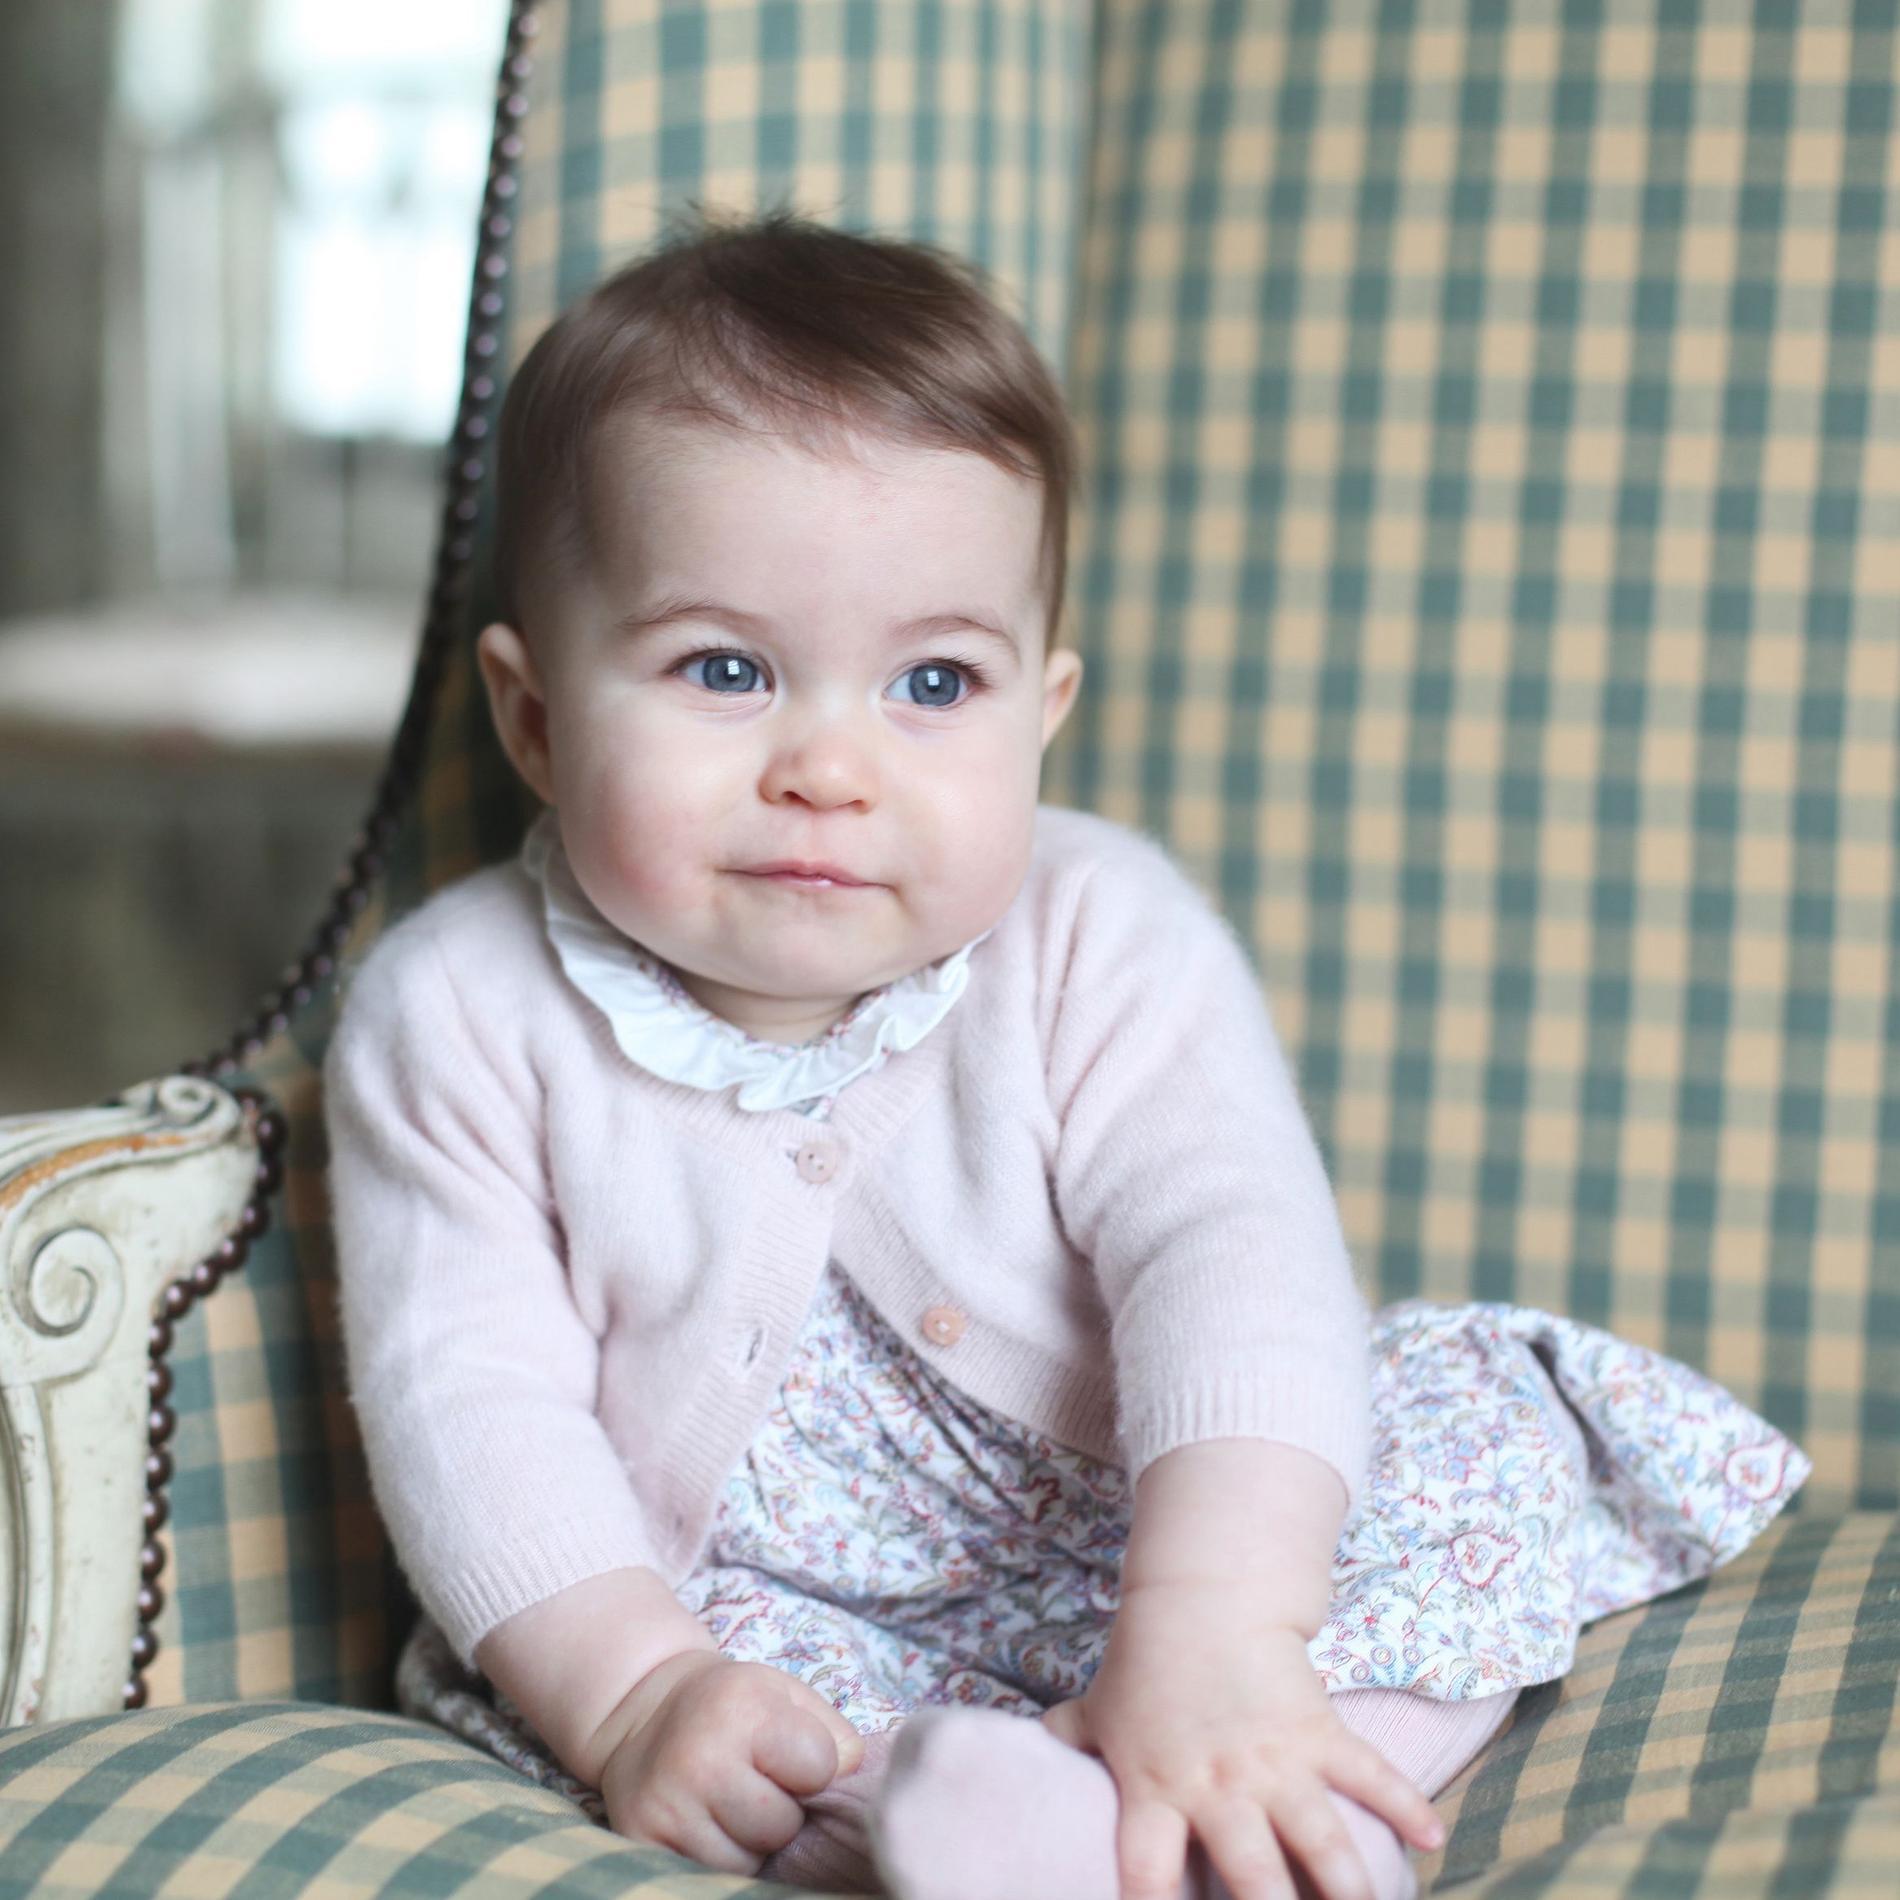 Les adorables petites robes de la princesse Charlotte de Cambridge - En liberty